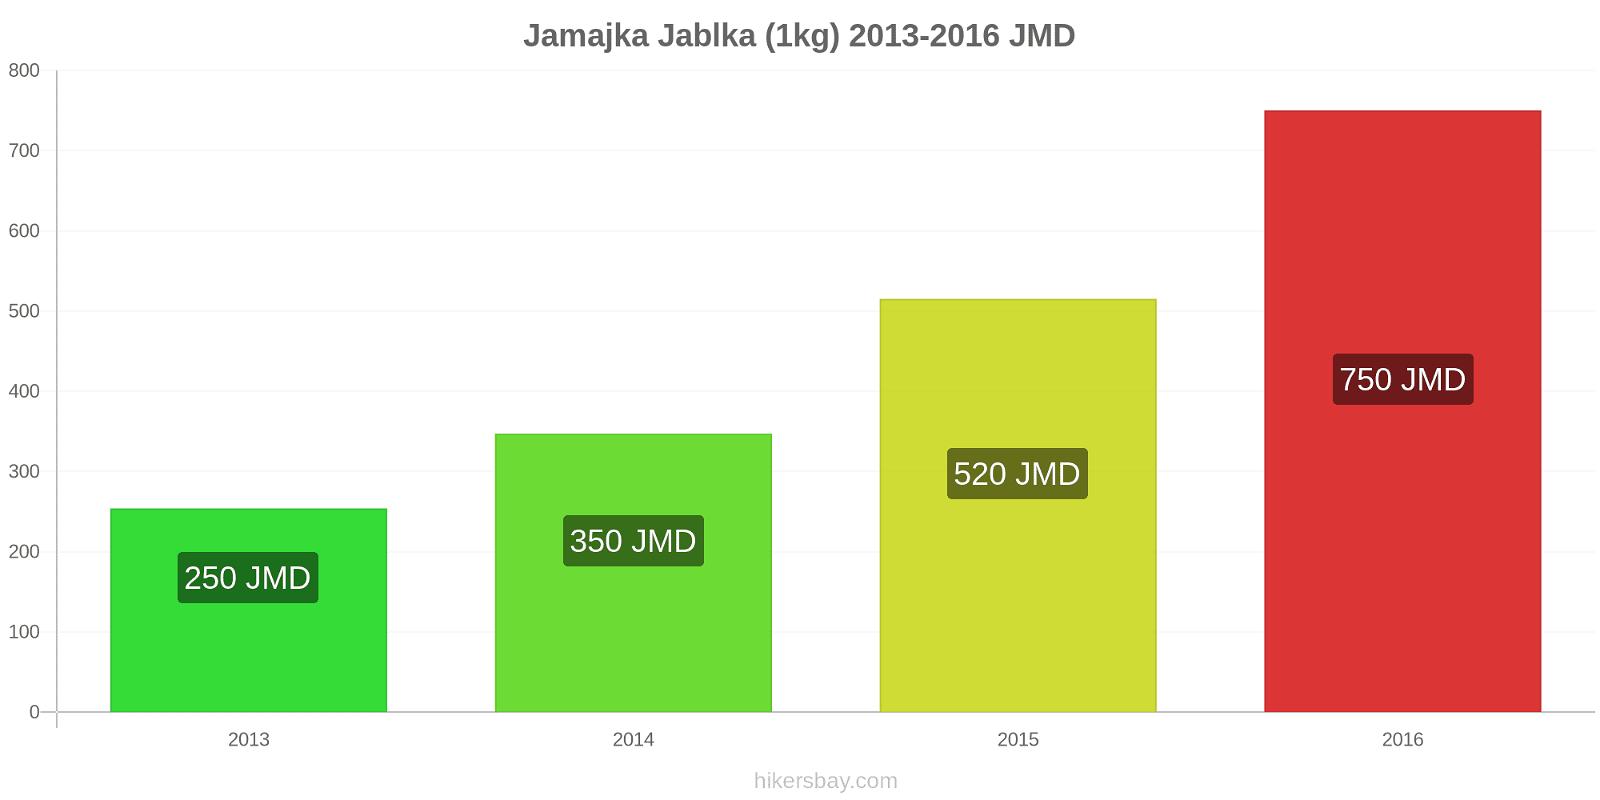 Jamajka změny cen Jablka (1kg) hikersbay.com